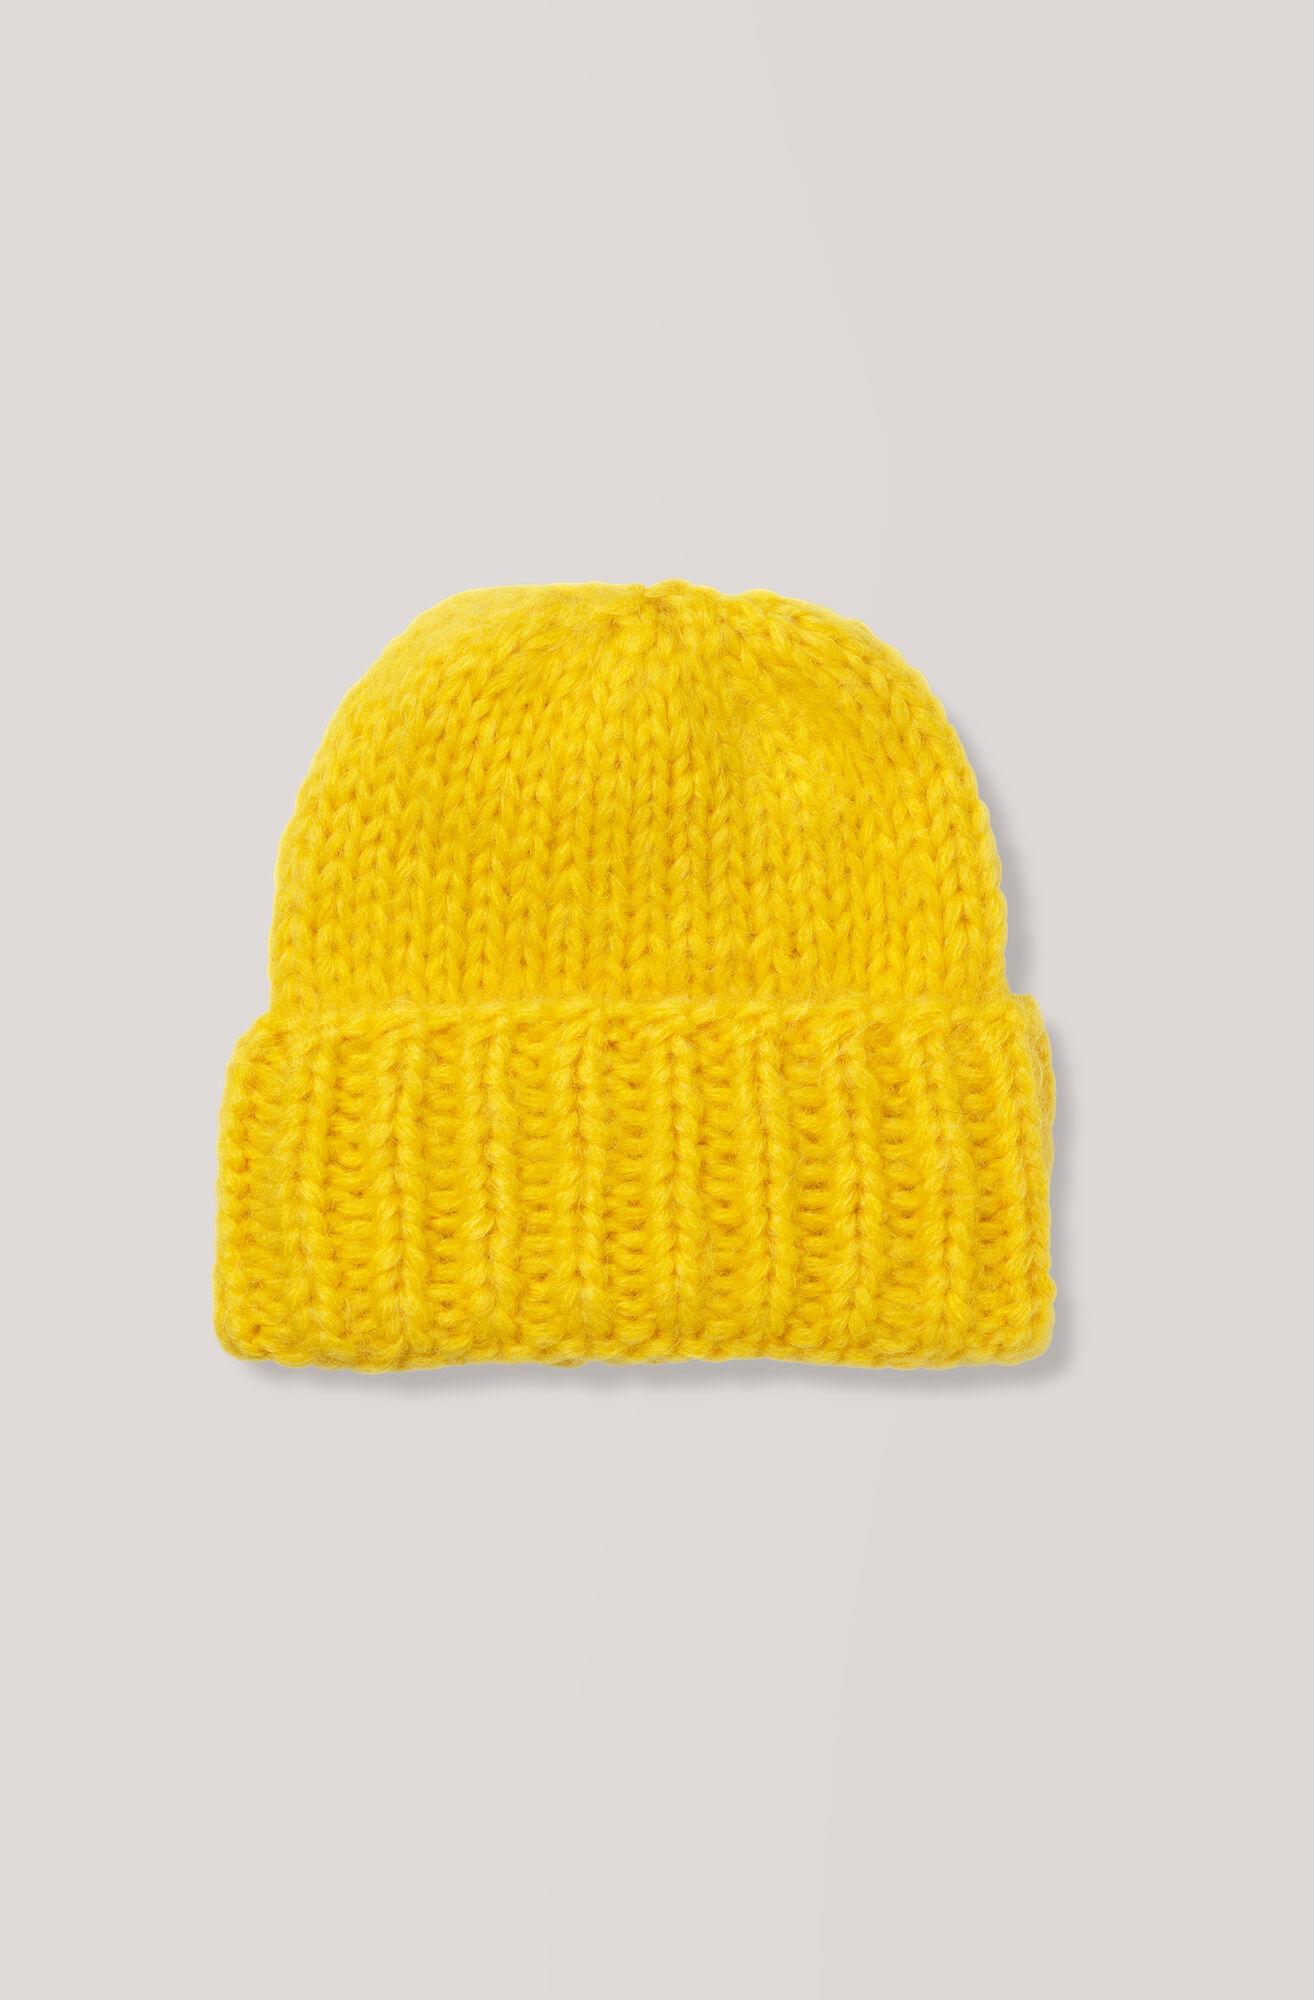 8235a72494df7 The Julliard Mohair Hat